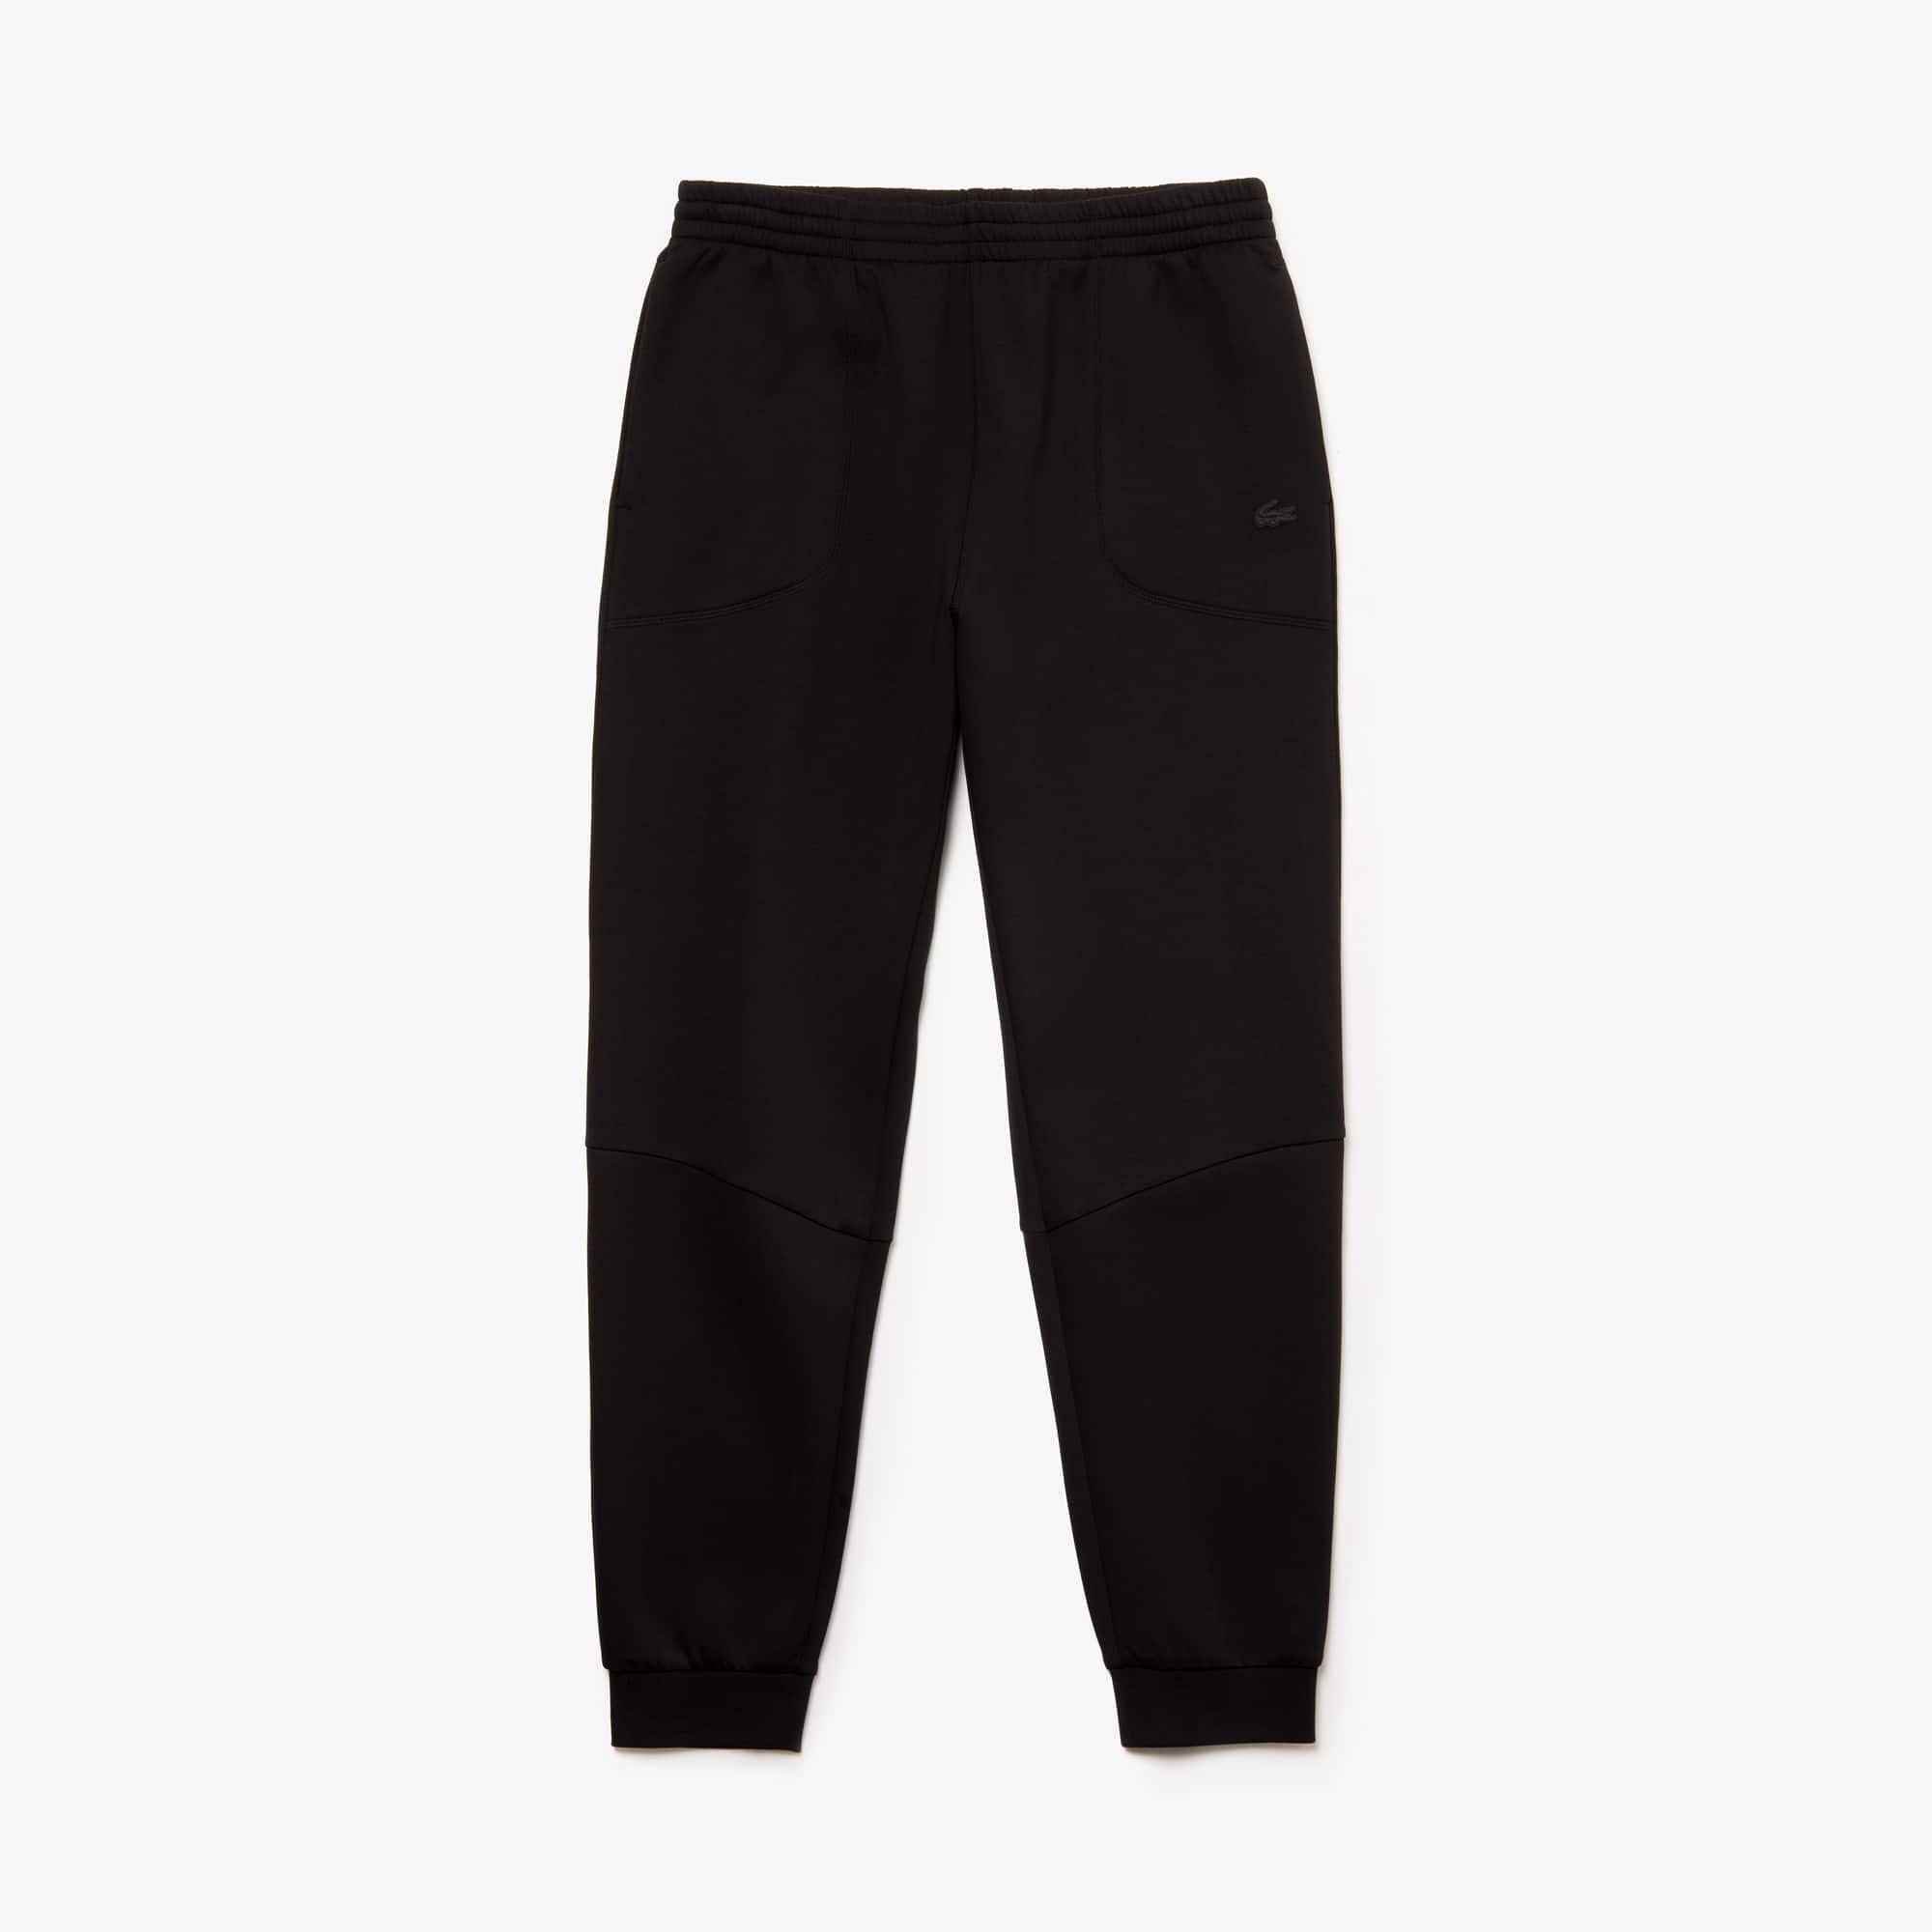 Mens 라코스테 Lacoste Motion Fleece Sweatpants,black